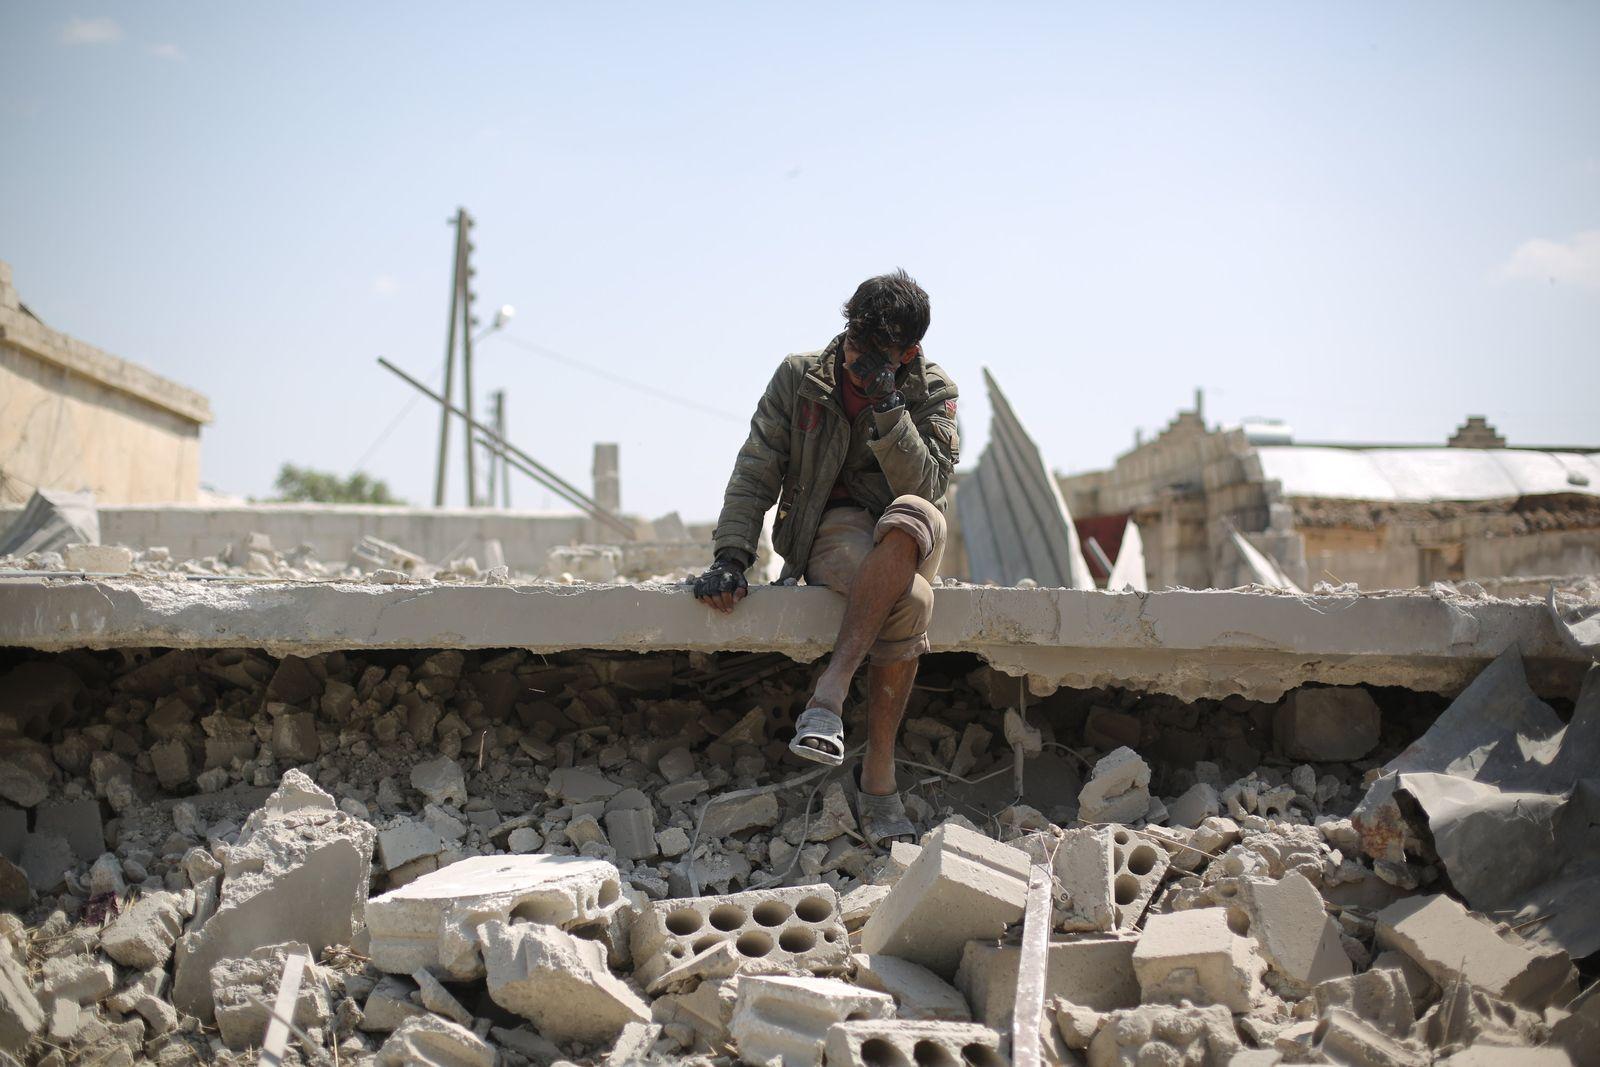 Mann nach Luftangriff in Idlib Syrien